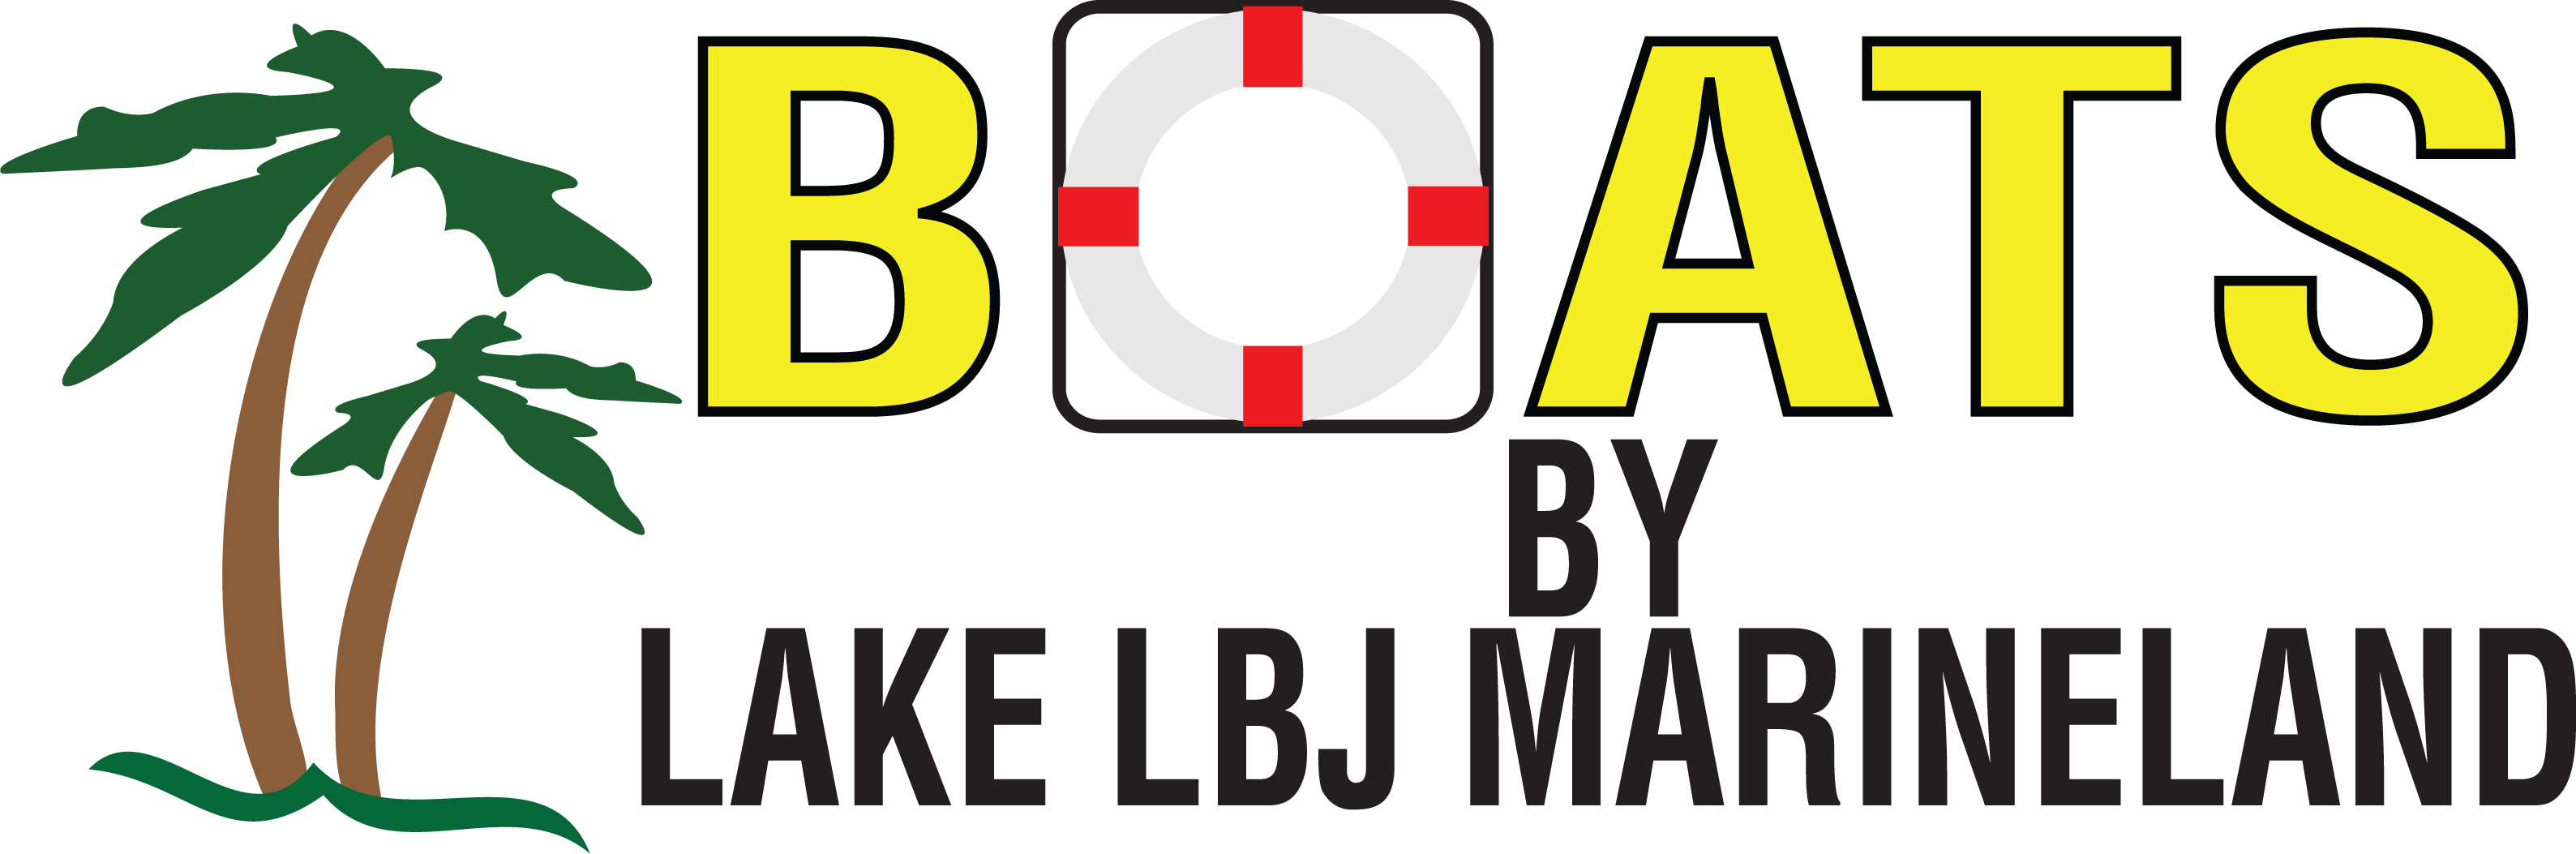 lakelbjmarineland.com logo